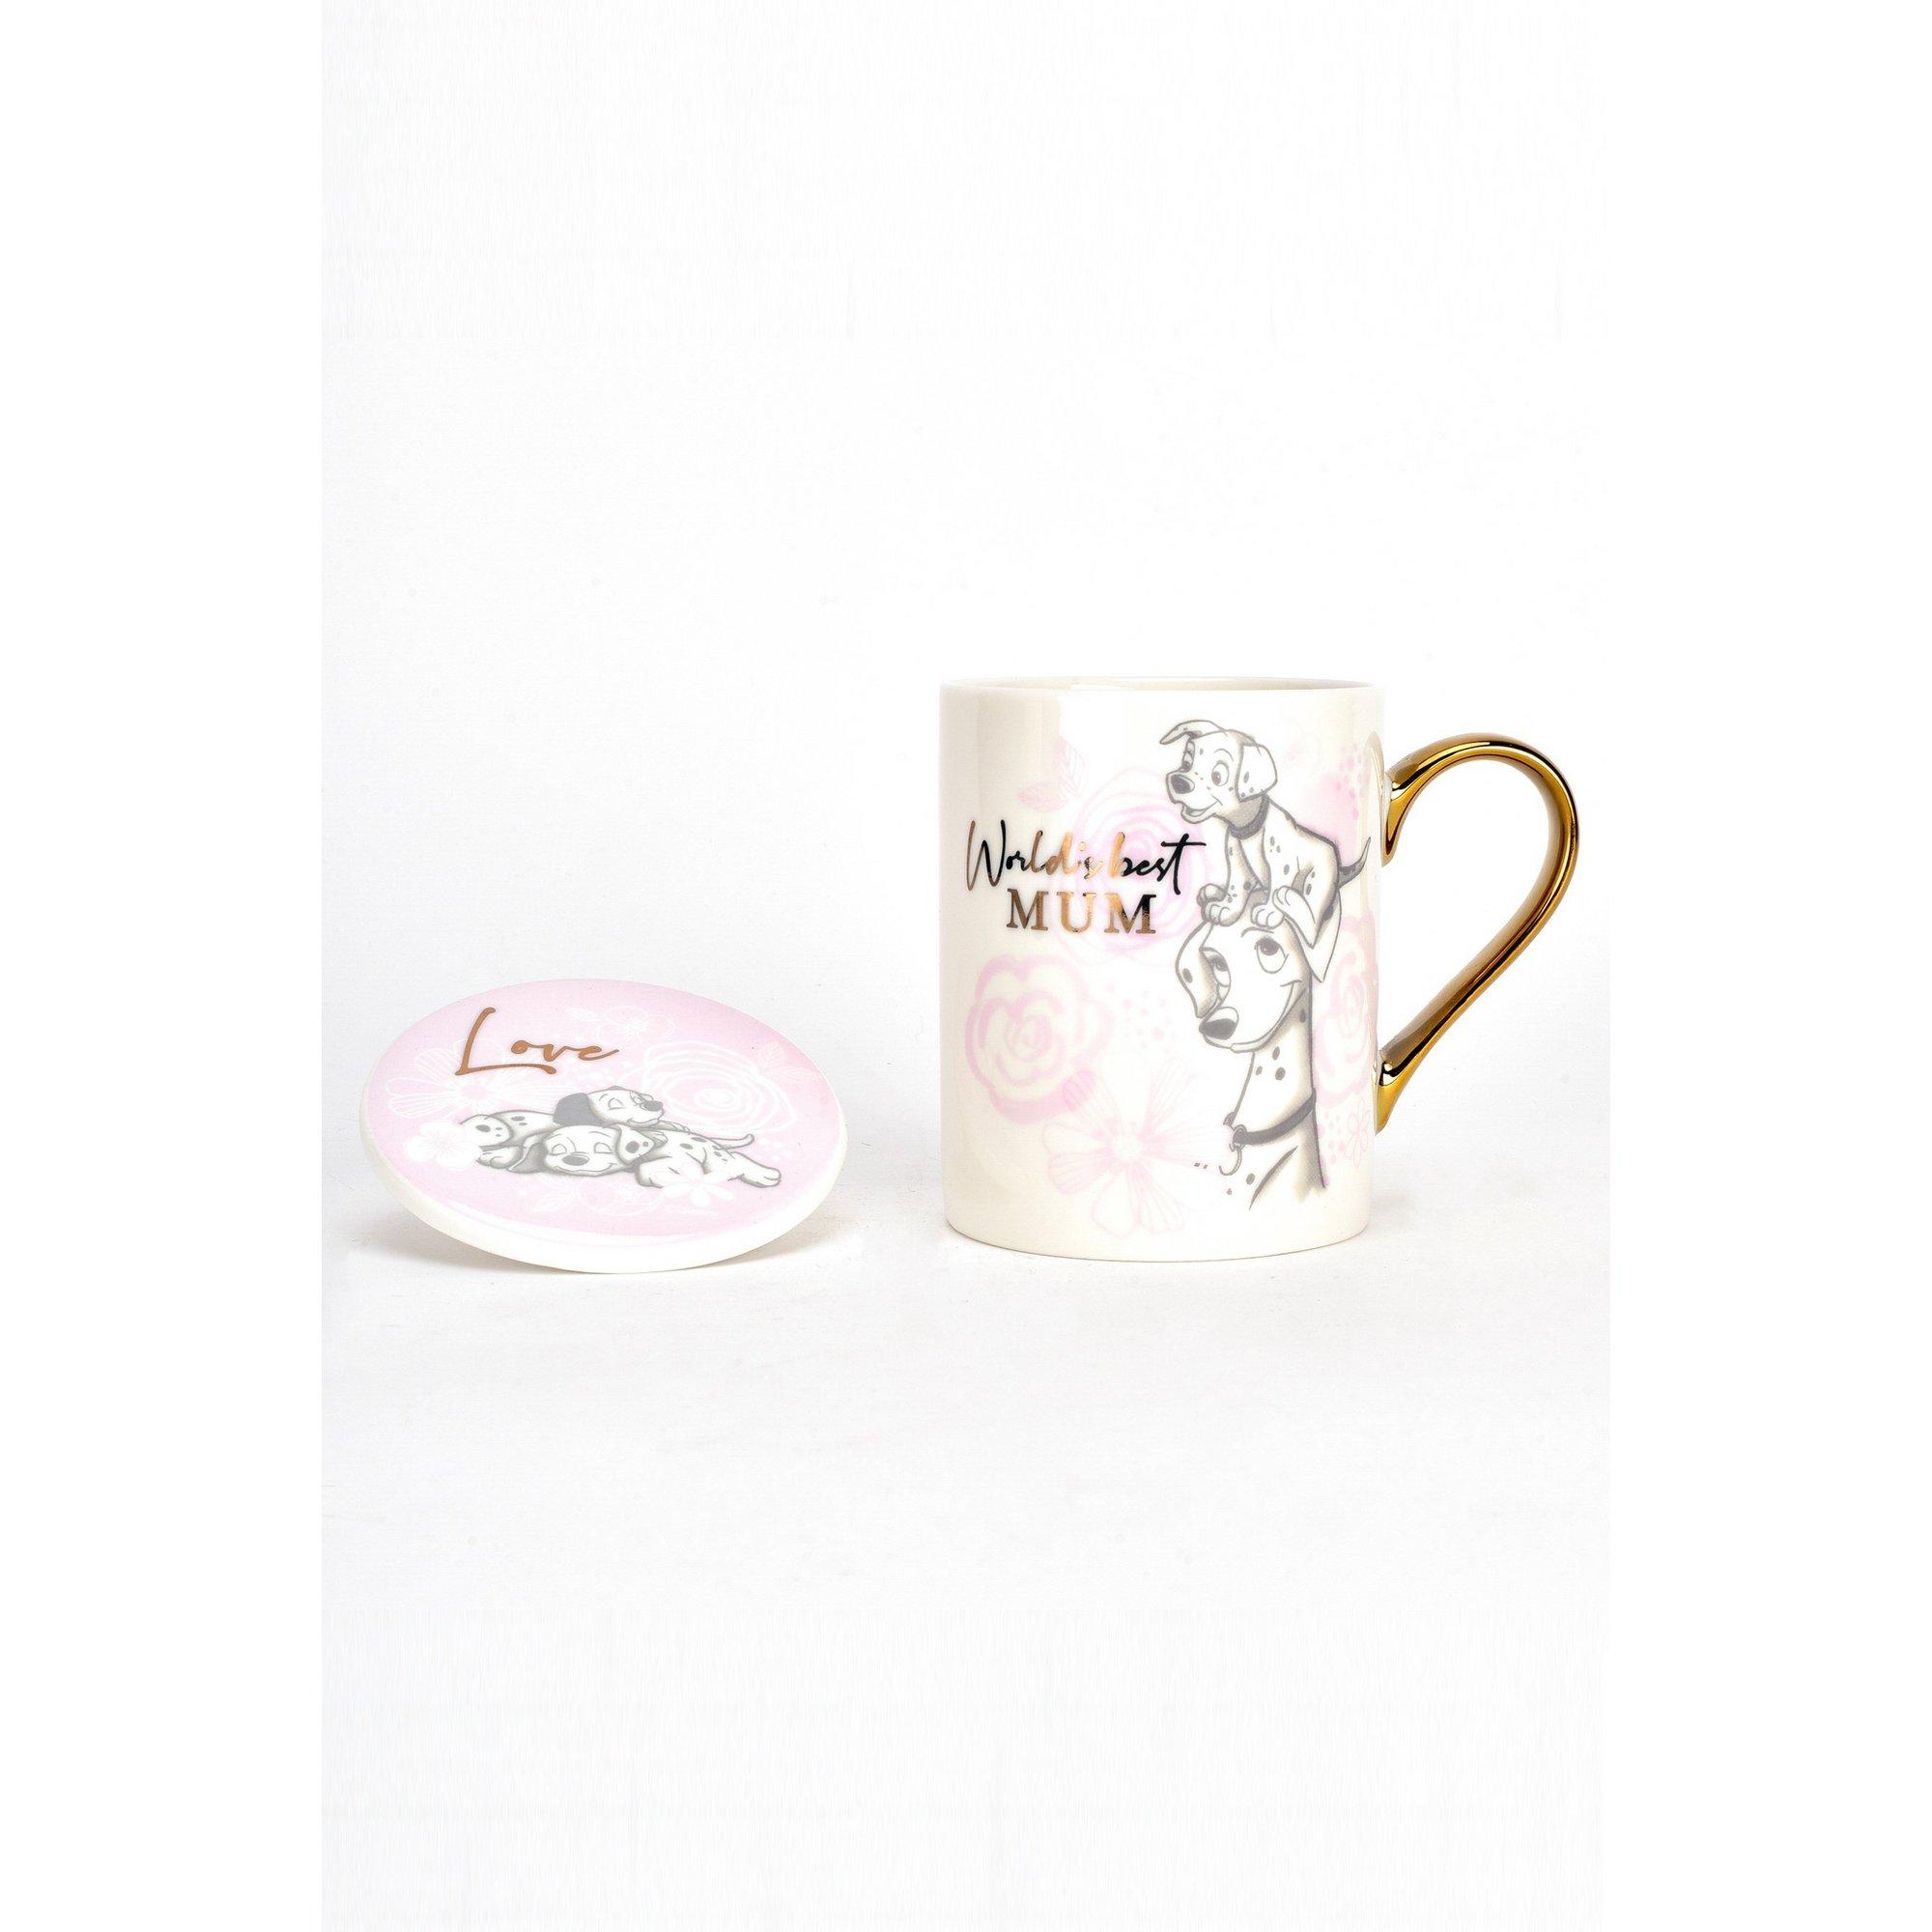 Image of Disney 101 Dalmatians Mum Mug and Coaster